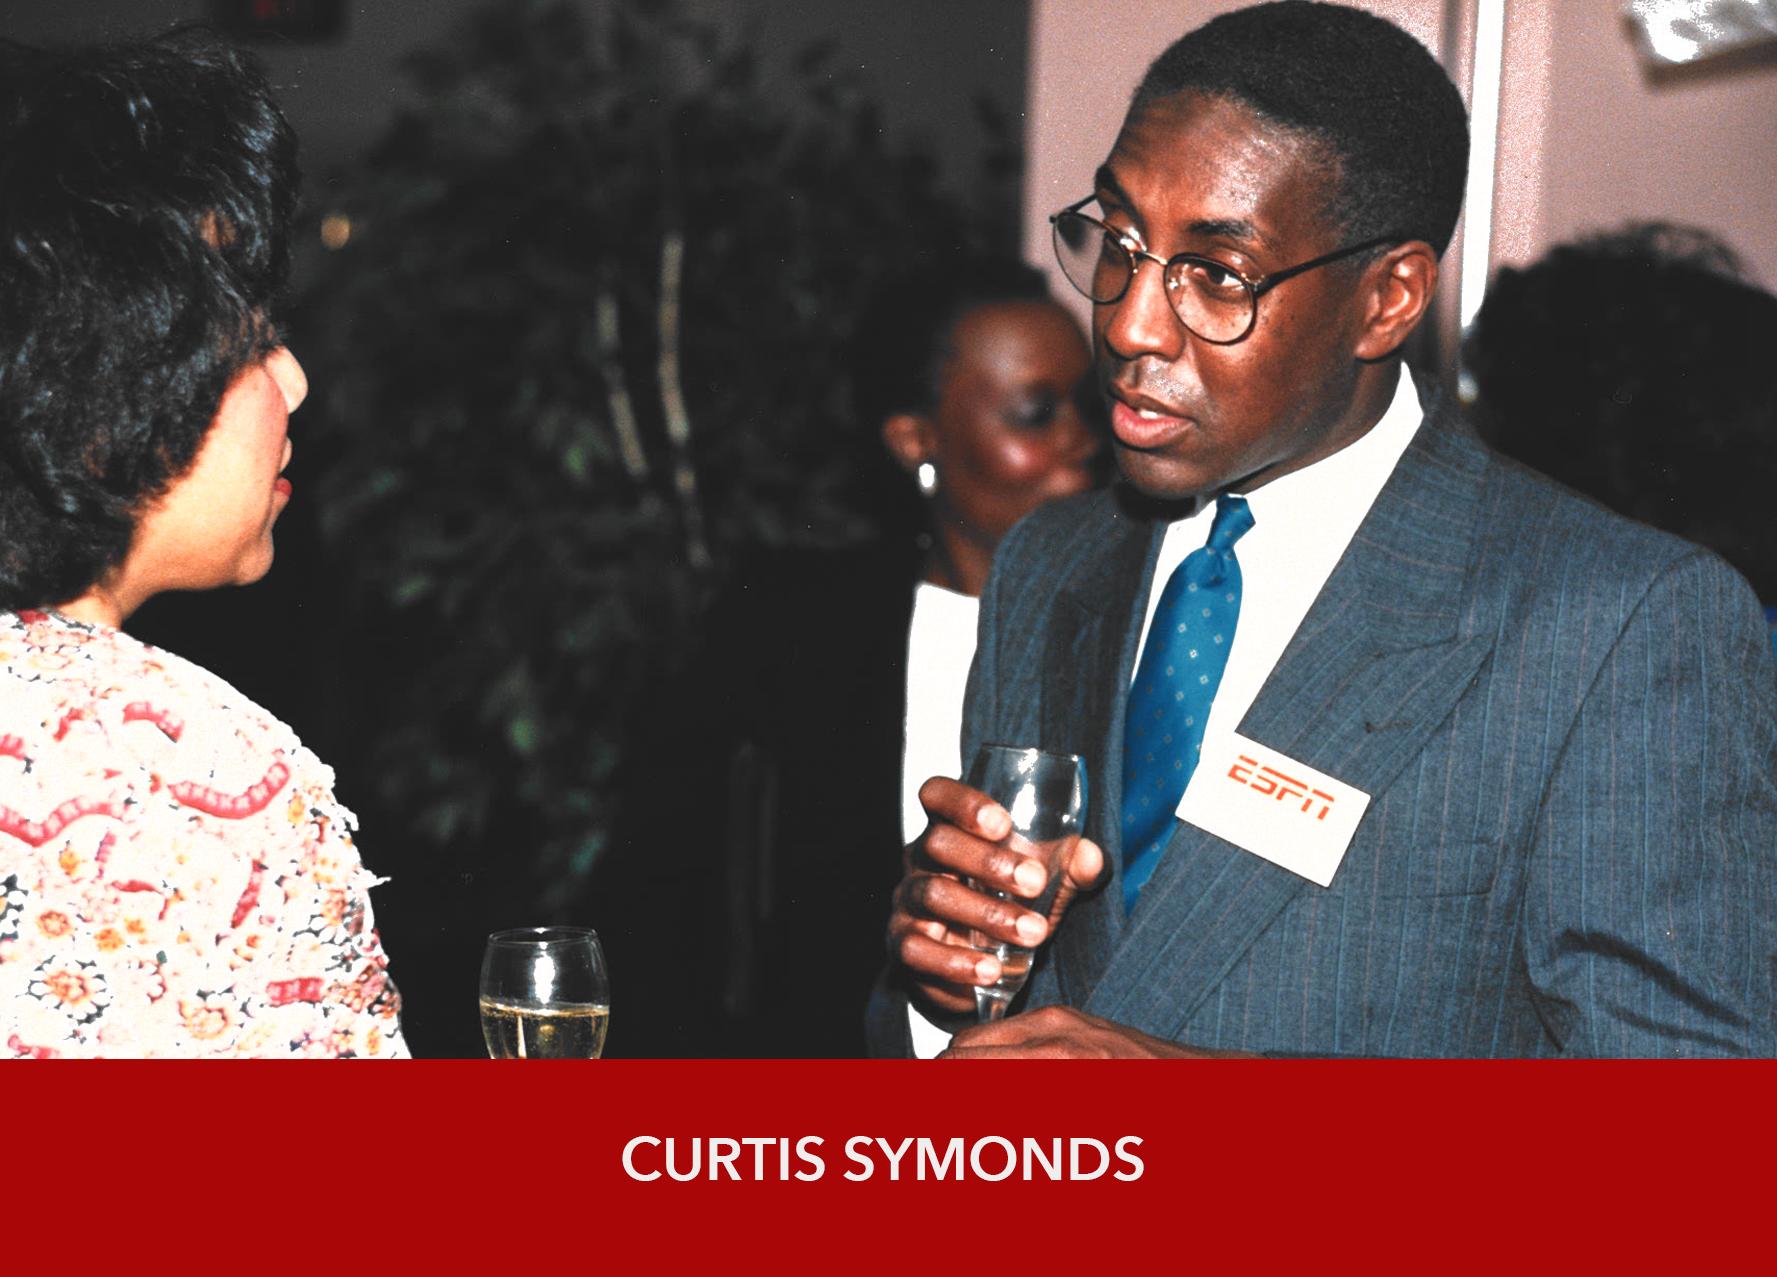 Curtis Symonds